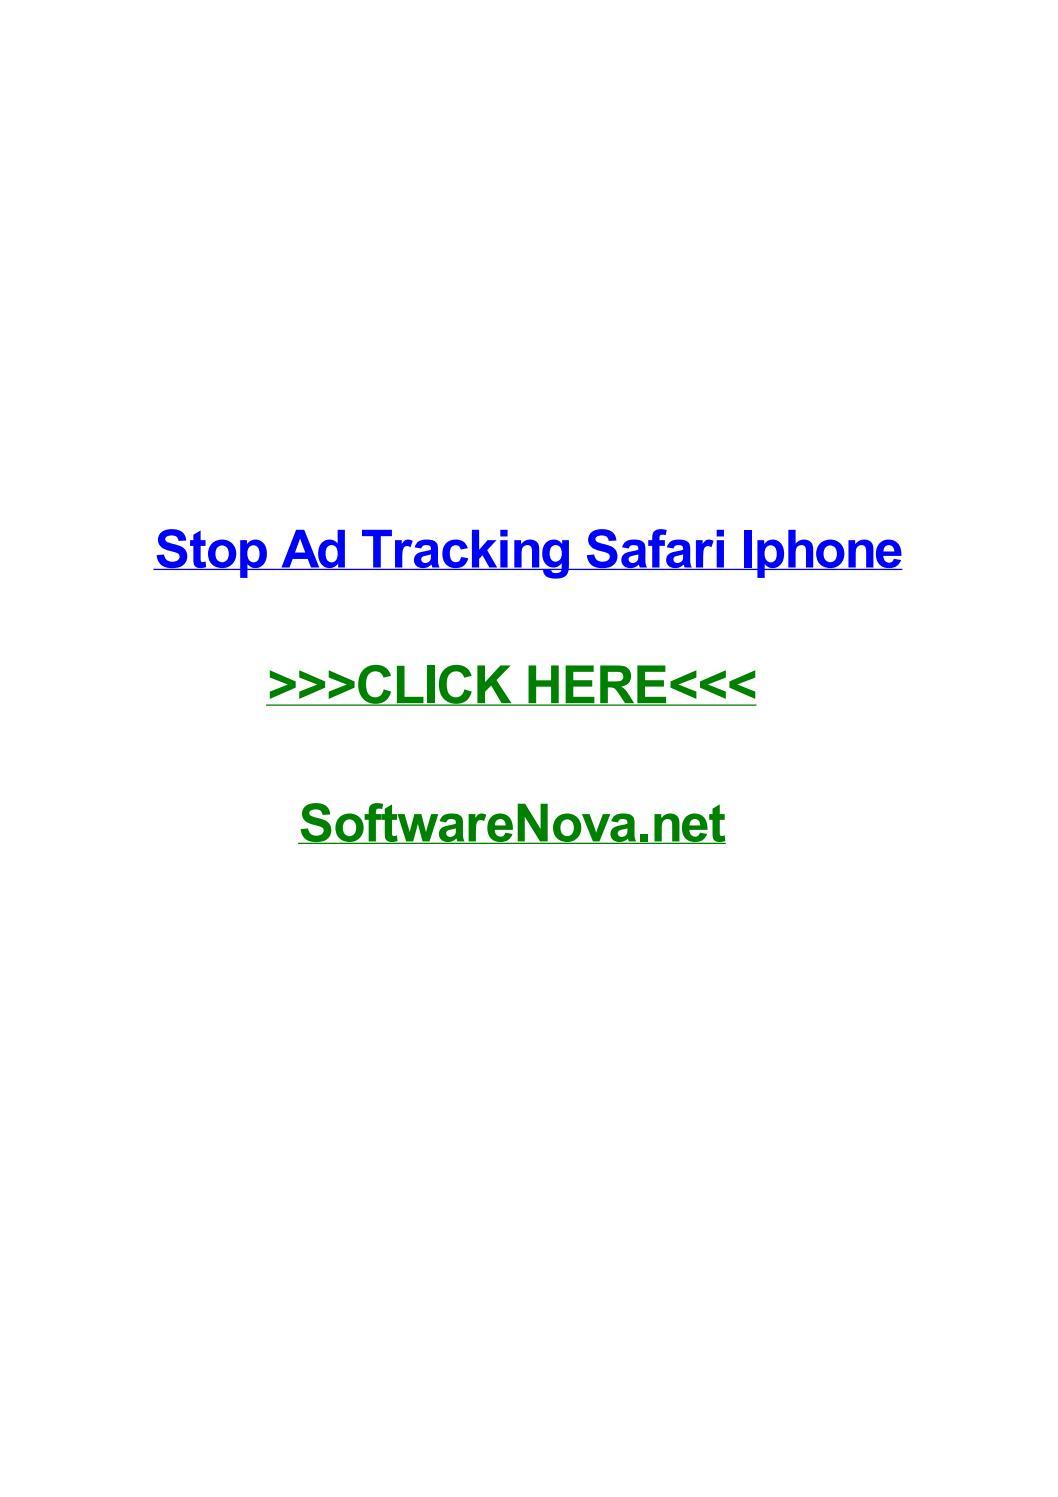 Stop ad tracking safari iphone by kimberlypnyb - issuu